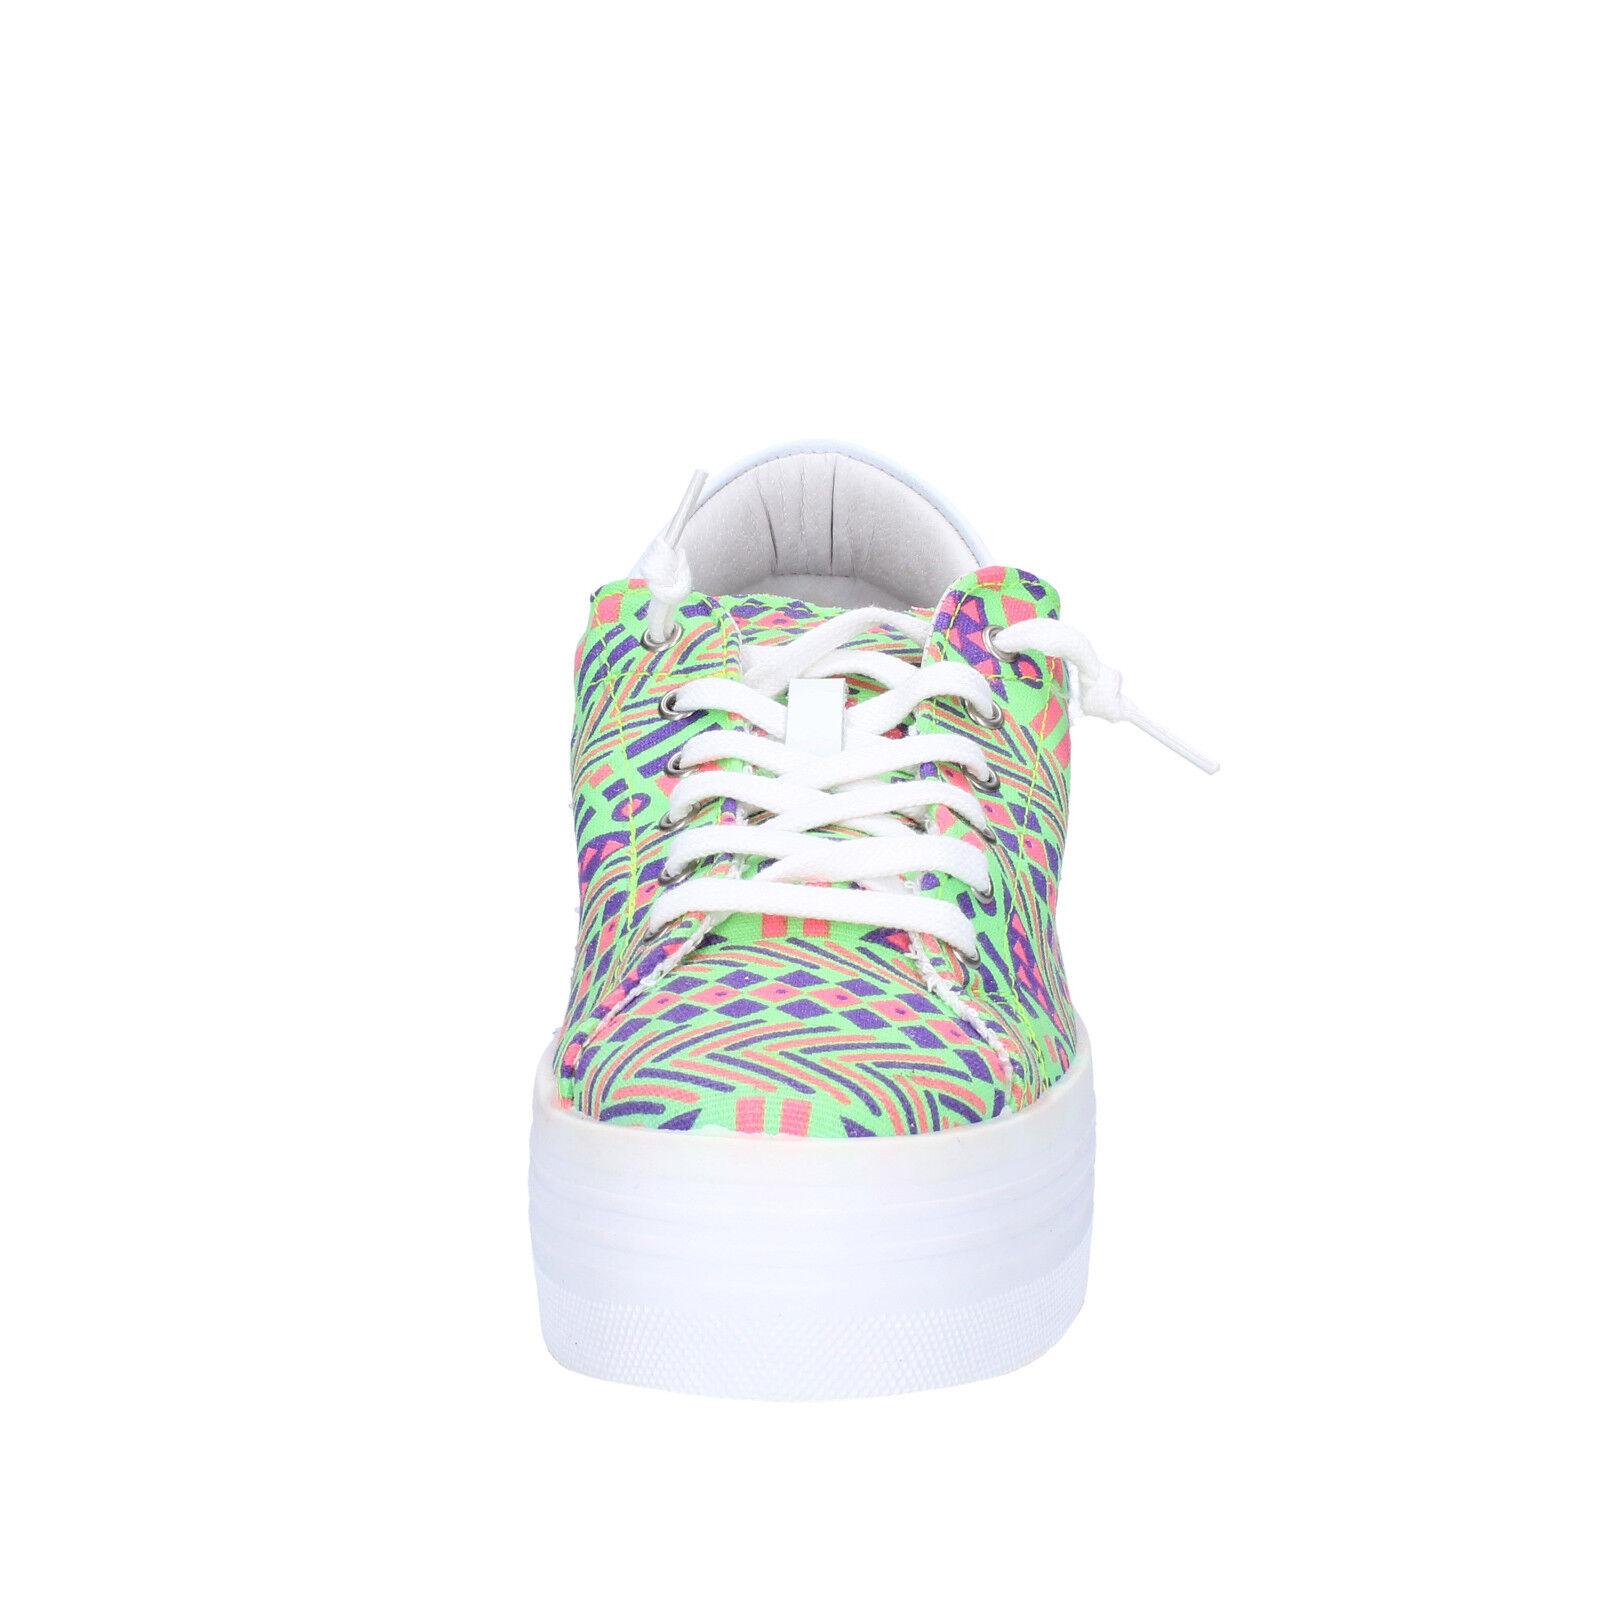 Damen schuhe 2 STAR  textil 40 EU sneakers Mehrfarbig textil  AP709-B be109d